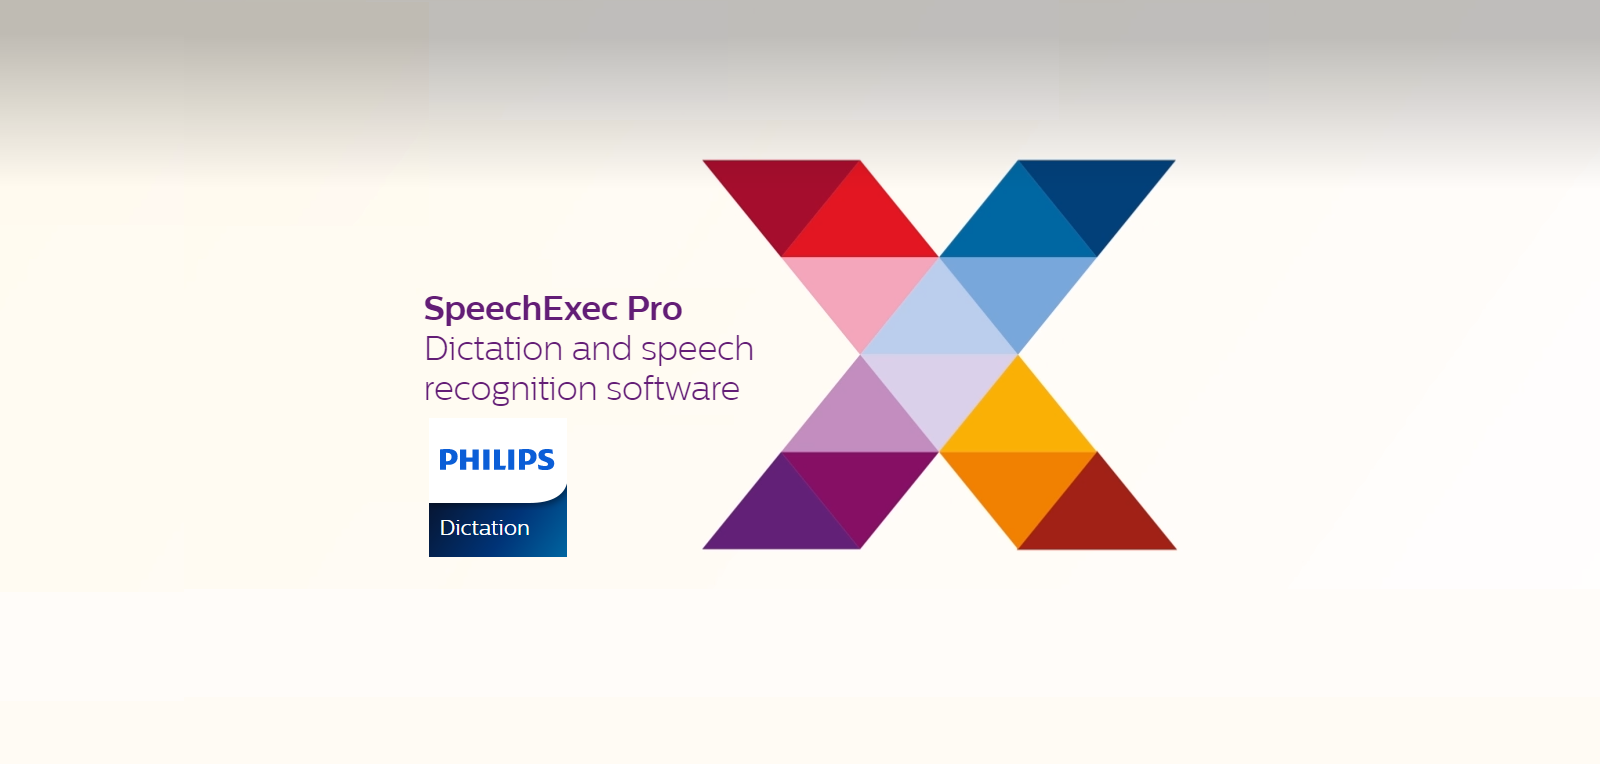 Philips Speech Exec Pro Dictation